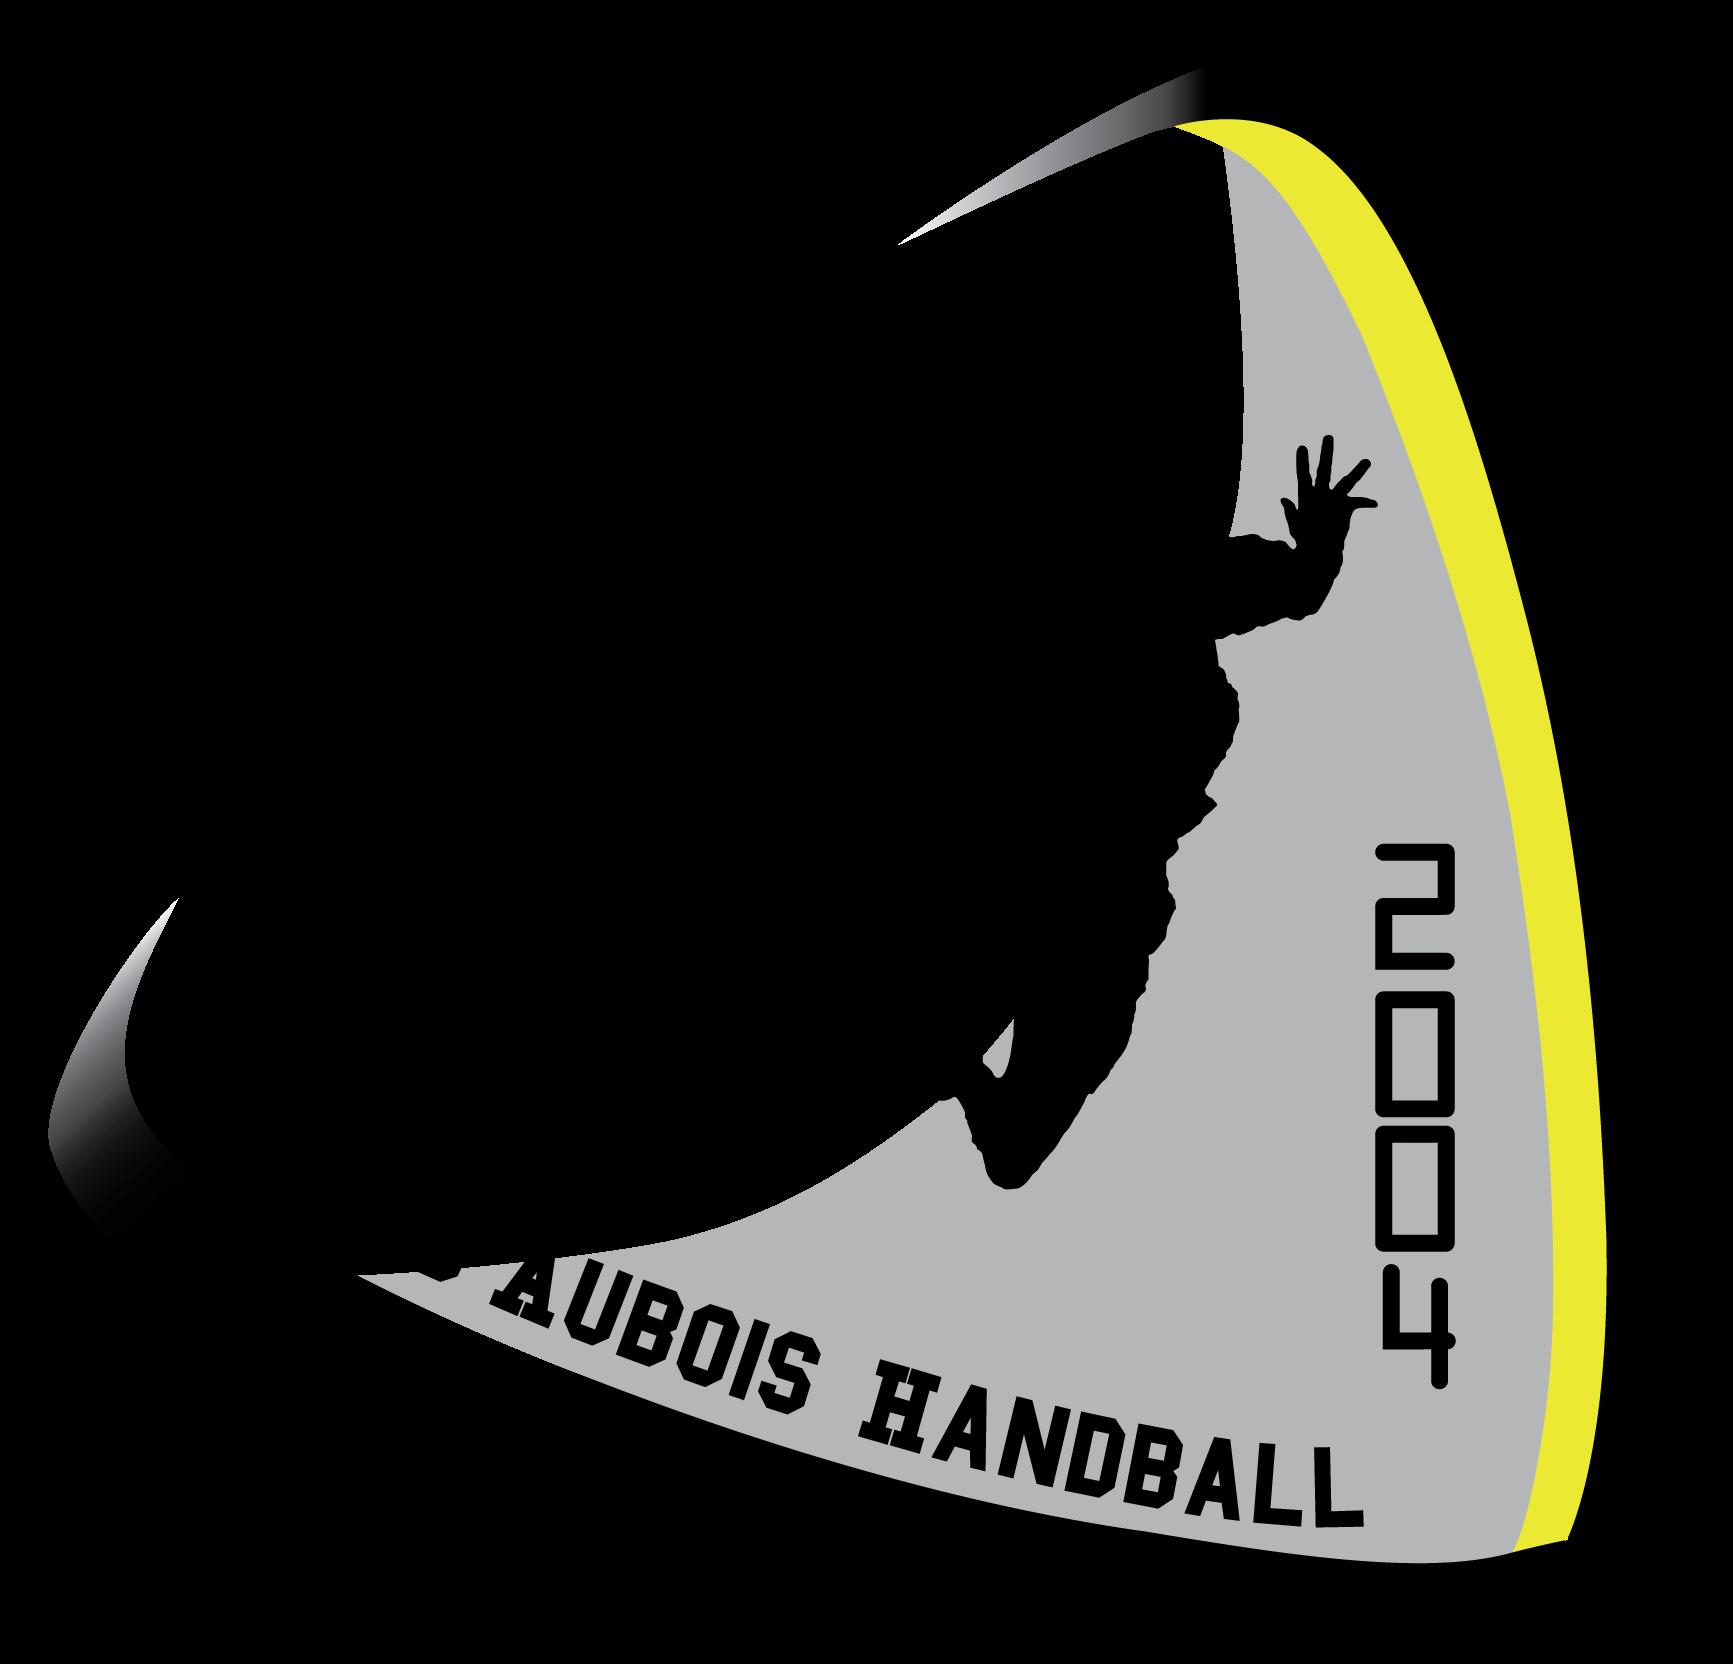 VAHB – Val d'Aubois Handball